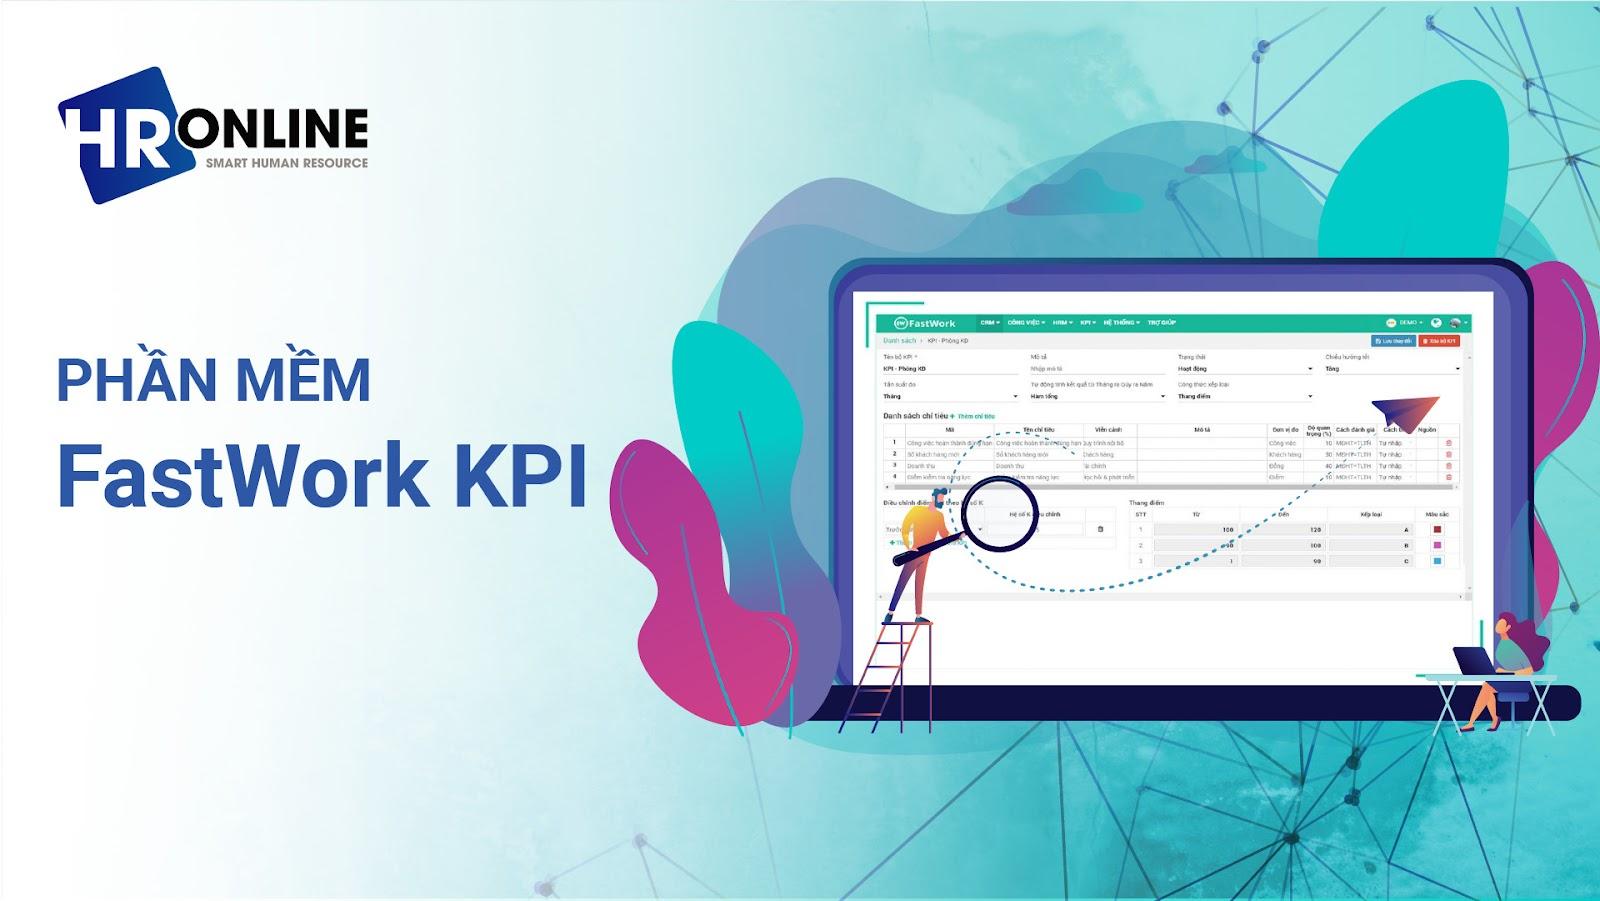 Phần mềm FastWork KPI